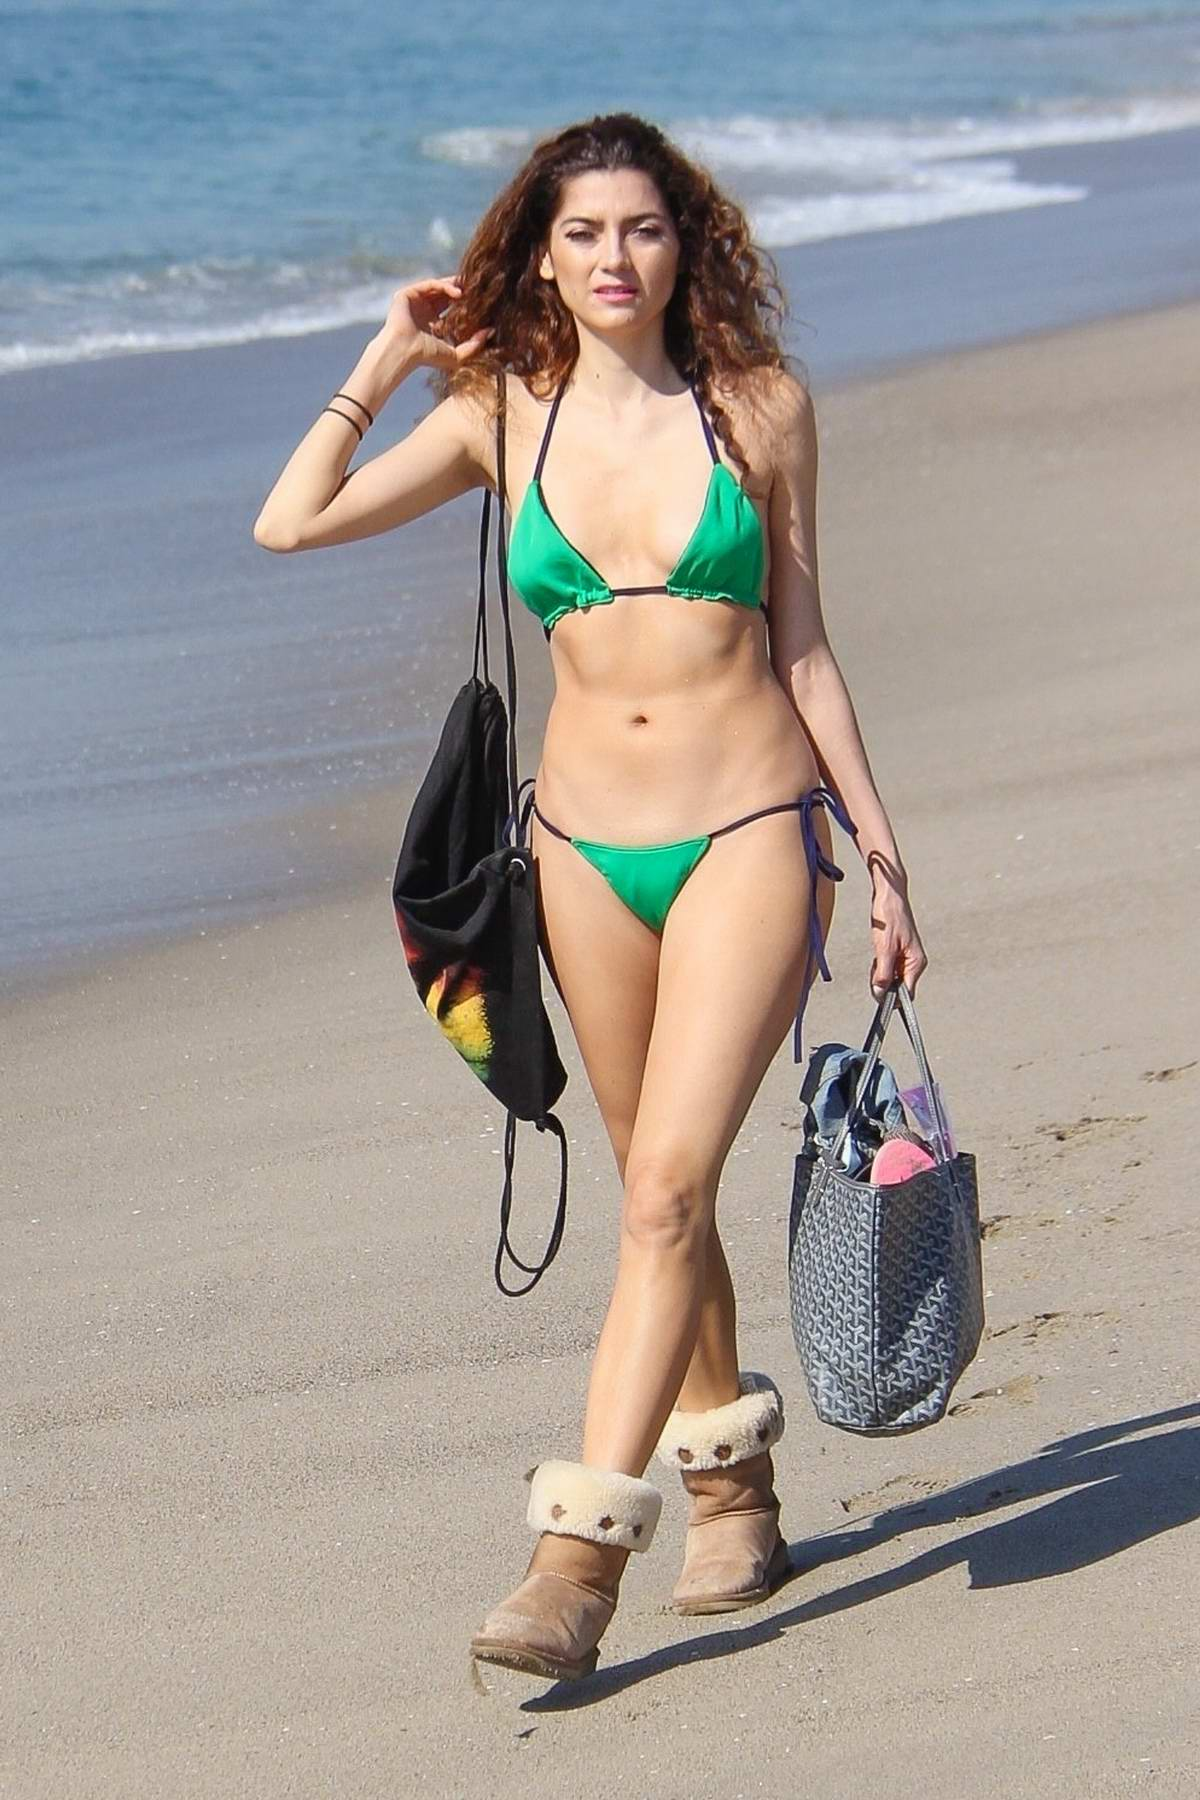 Blanca Blanco spotted walking along the beach wearing a green bikini and ugg boots in Venice beach, California